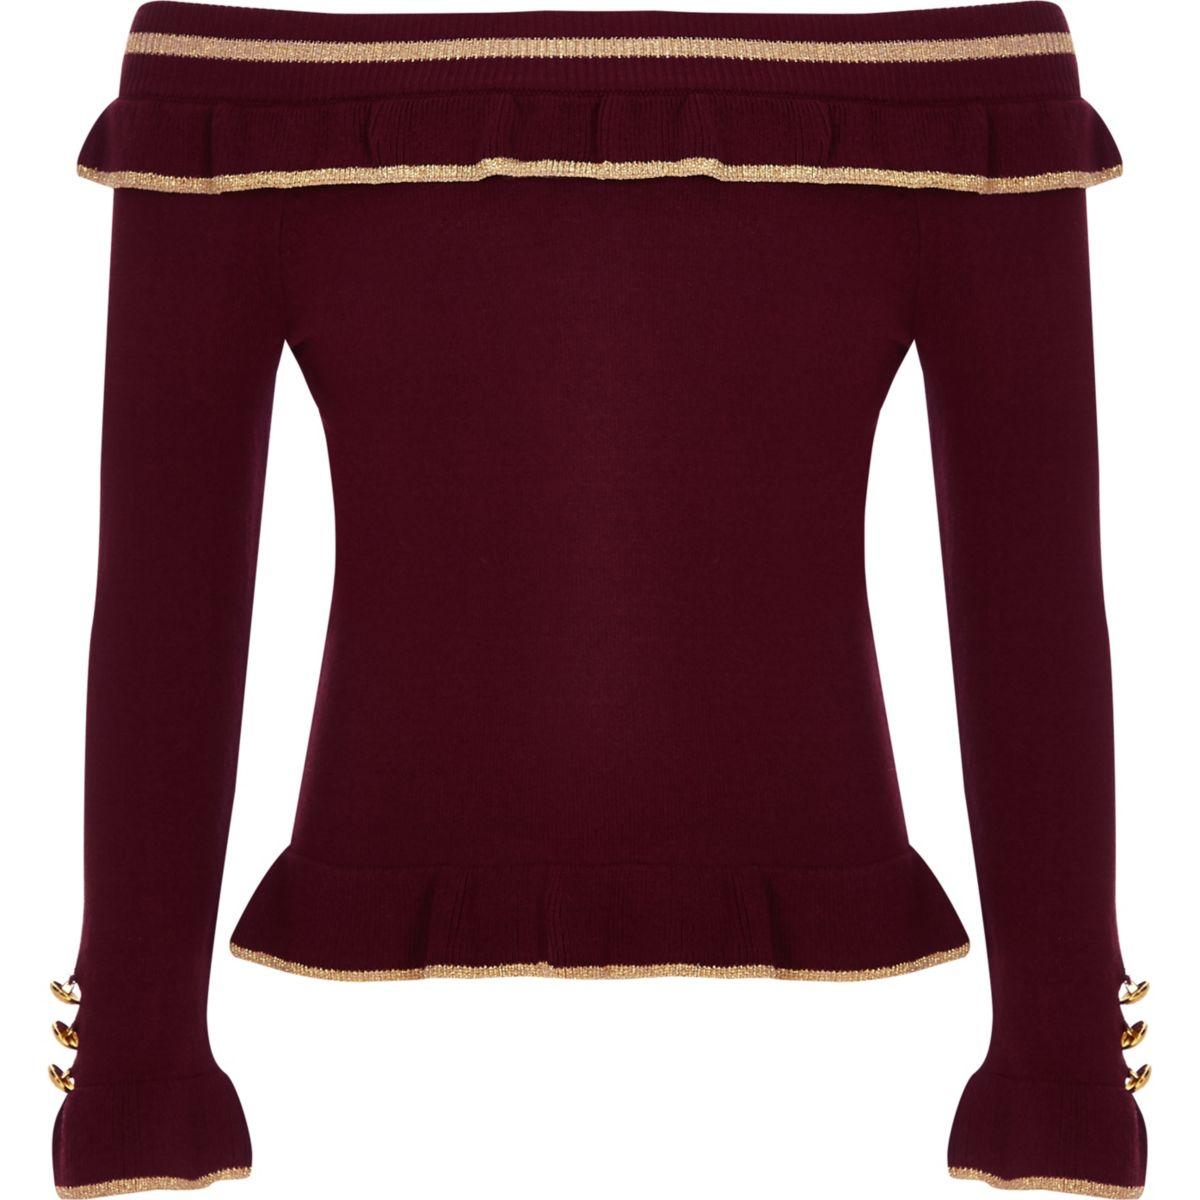 8821abede2b1c Girls burgundy rib bardot frill top - Long Sleeve Tops - Tops - girls